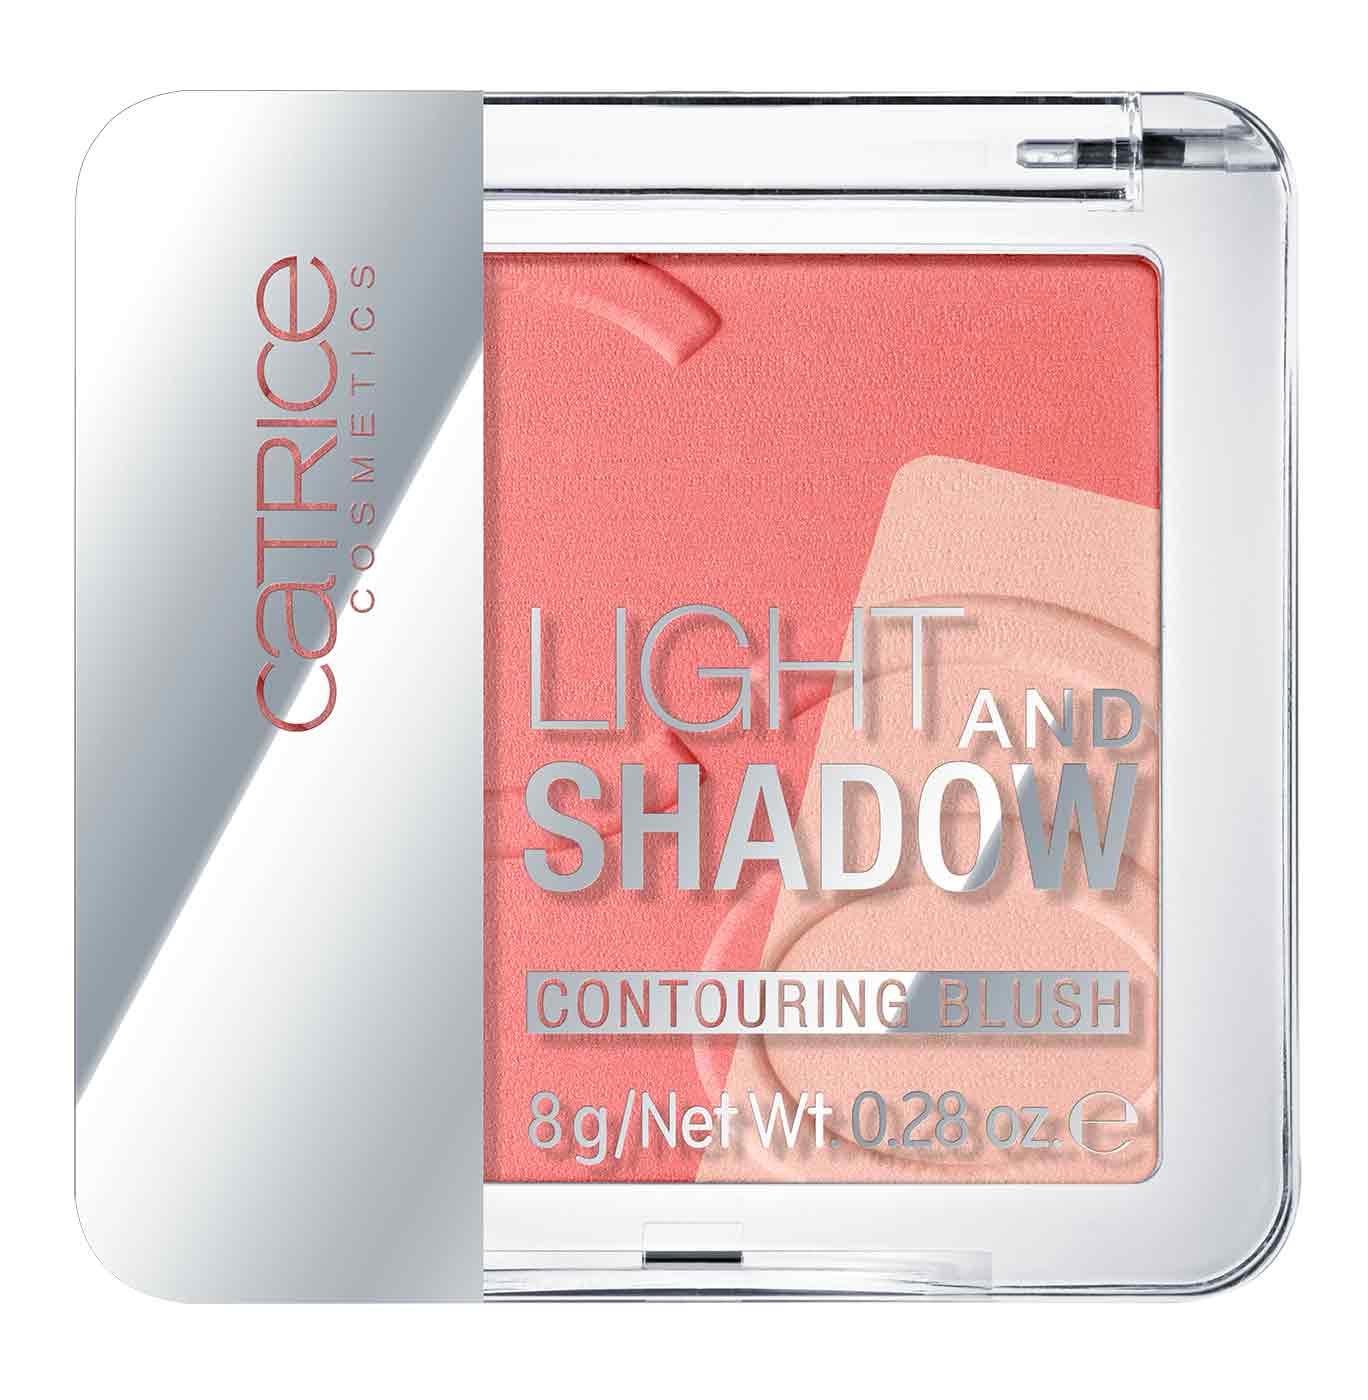 catr_light-shadow-contouring-blush_020_1477492296